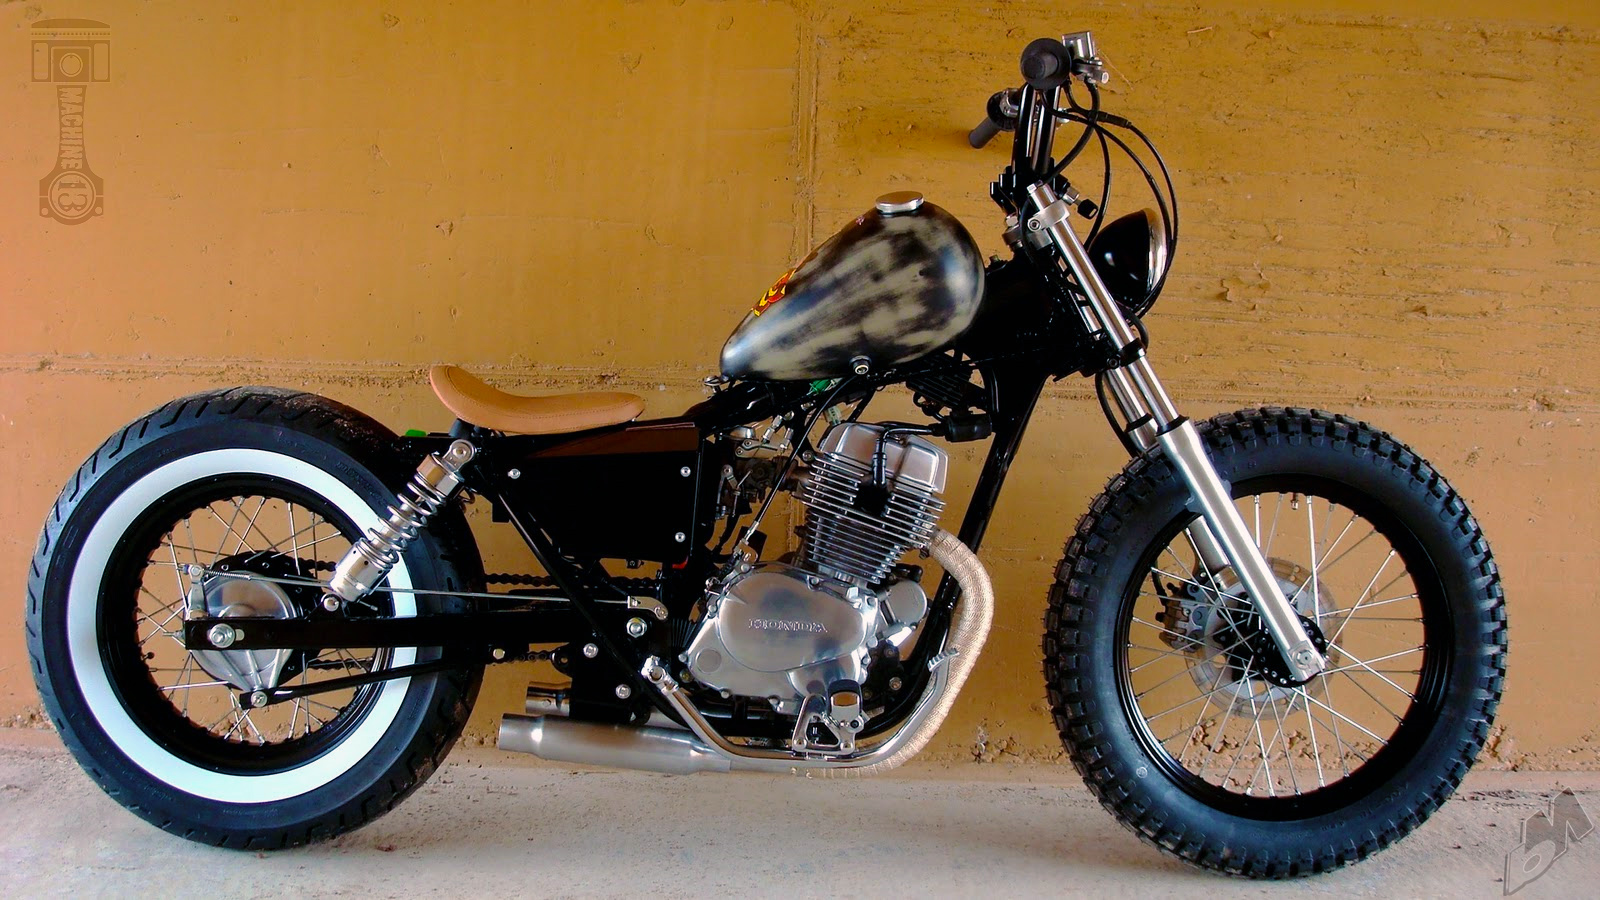 Kyle S Honda Rebel By Machine 13 Bikermetric